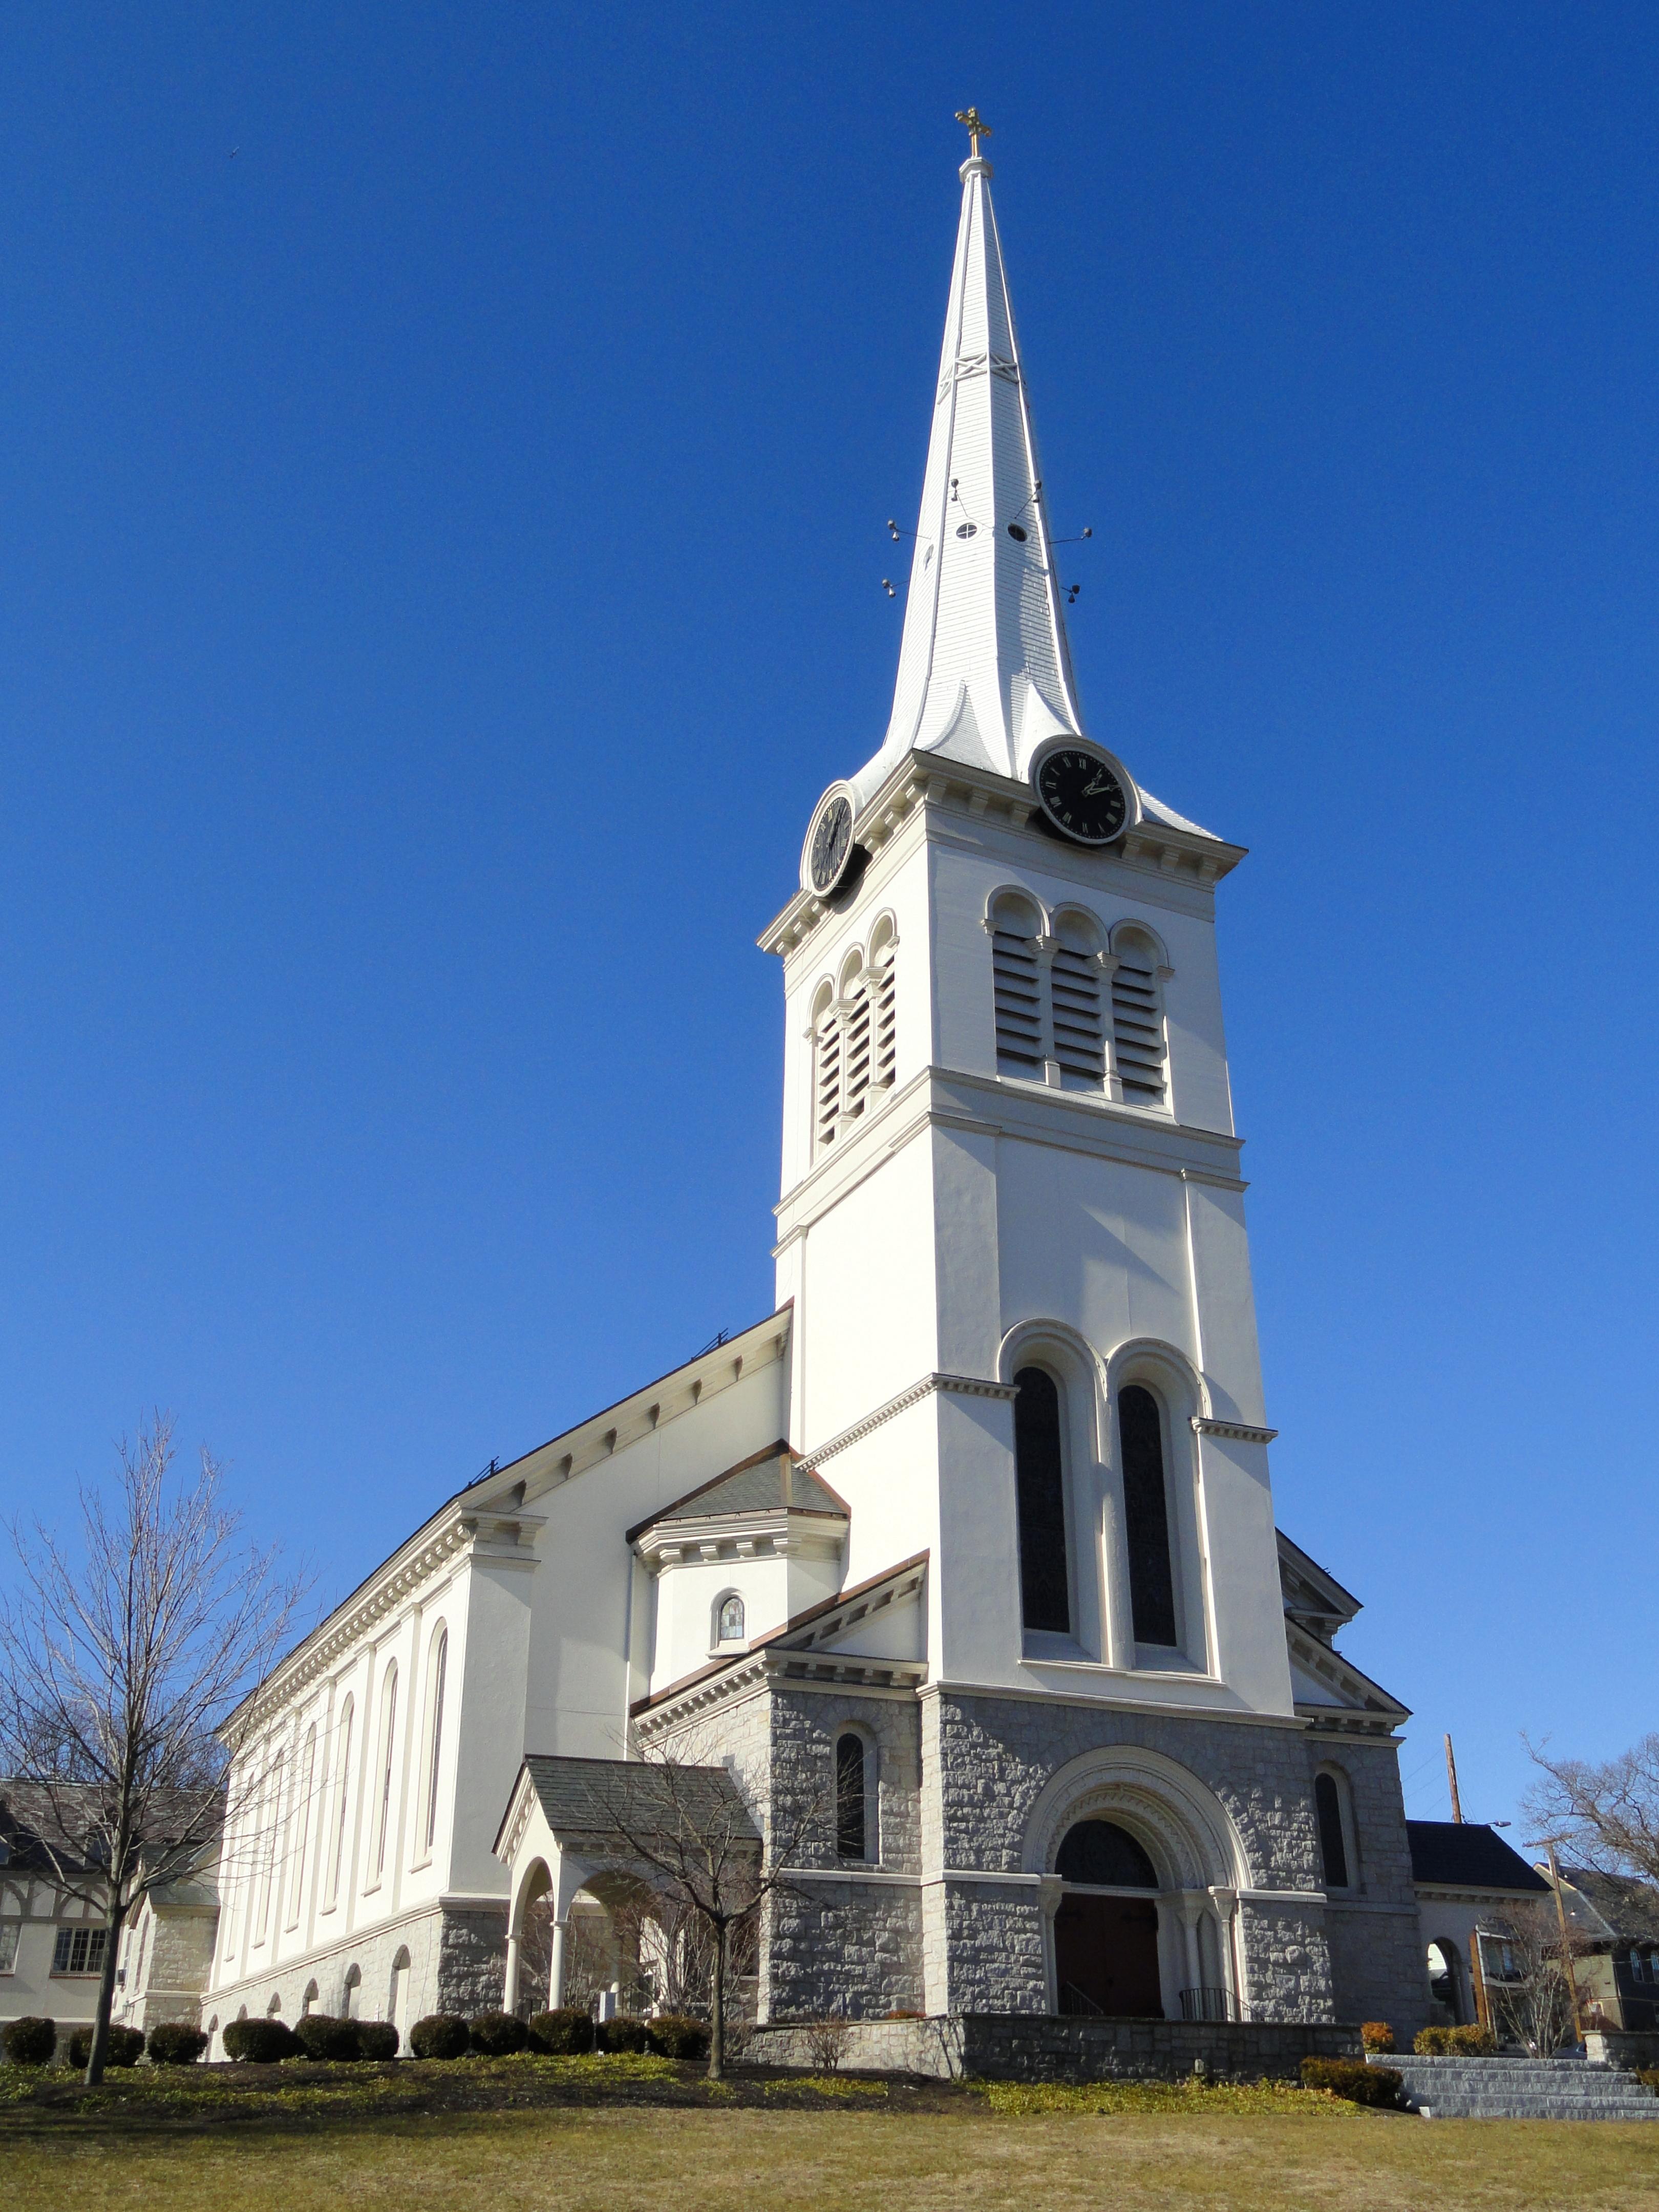 Church Buildings For Sale In Orlando Florida